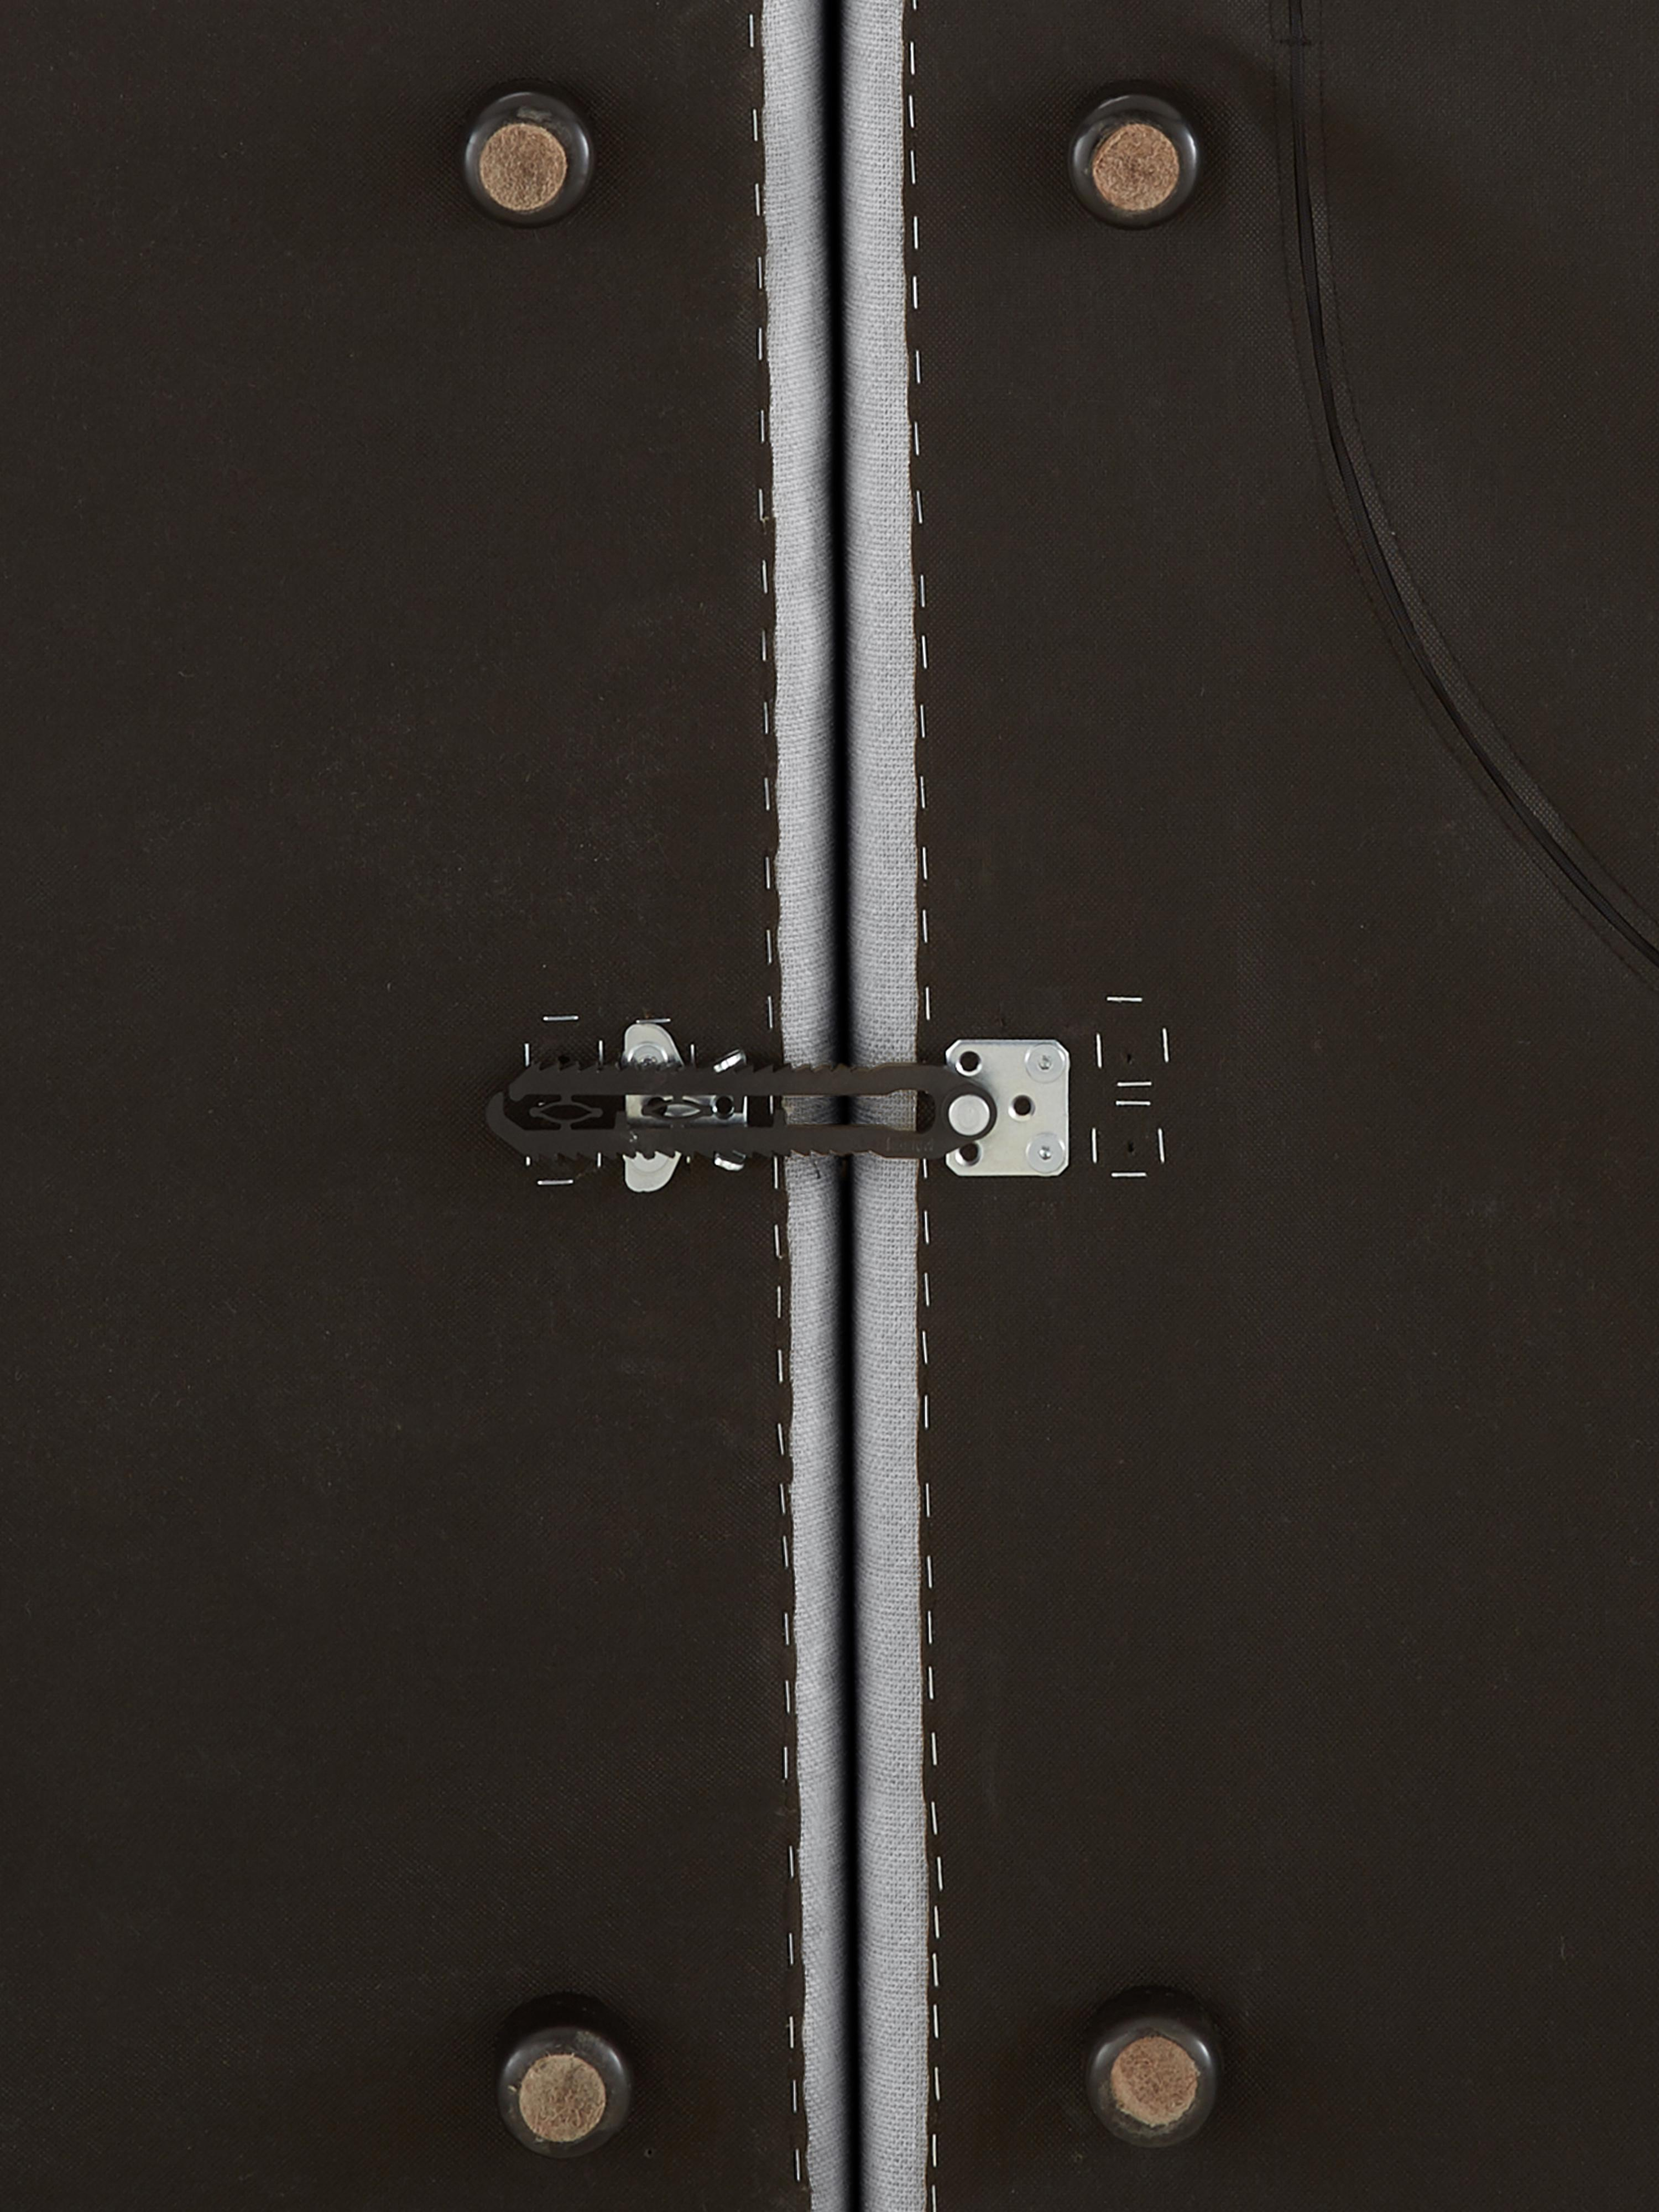 Modulares Ecksofa Lennon, Bezug: Polyester Der hochwertige, Gestell: Massives Kiefernholz, Spe, Webstoff Hellgrau, B 326 x T 207 cm